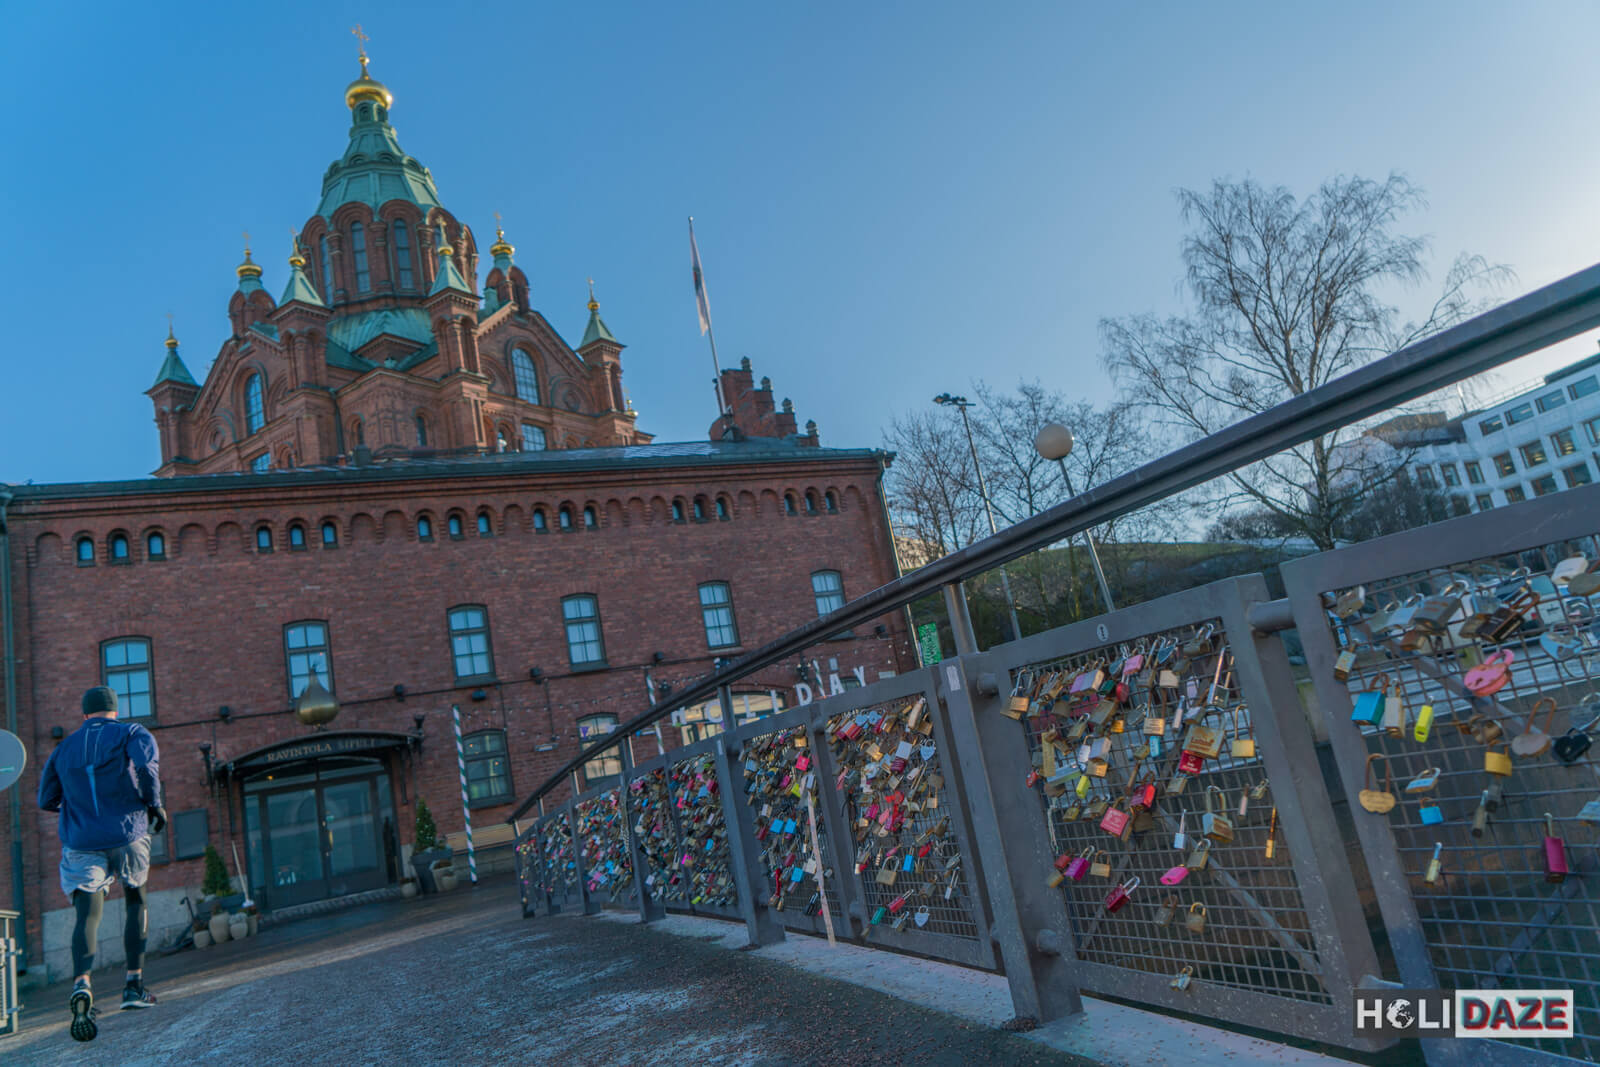 Jogger crossing the Helsinki love lock bridge